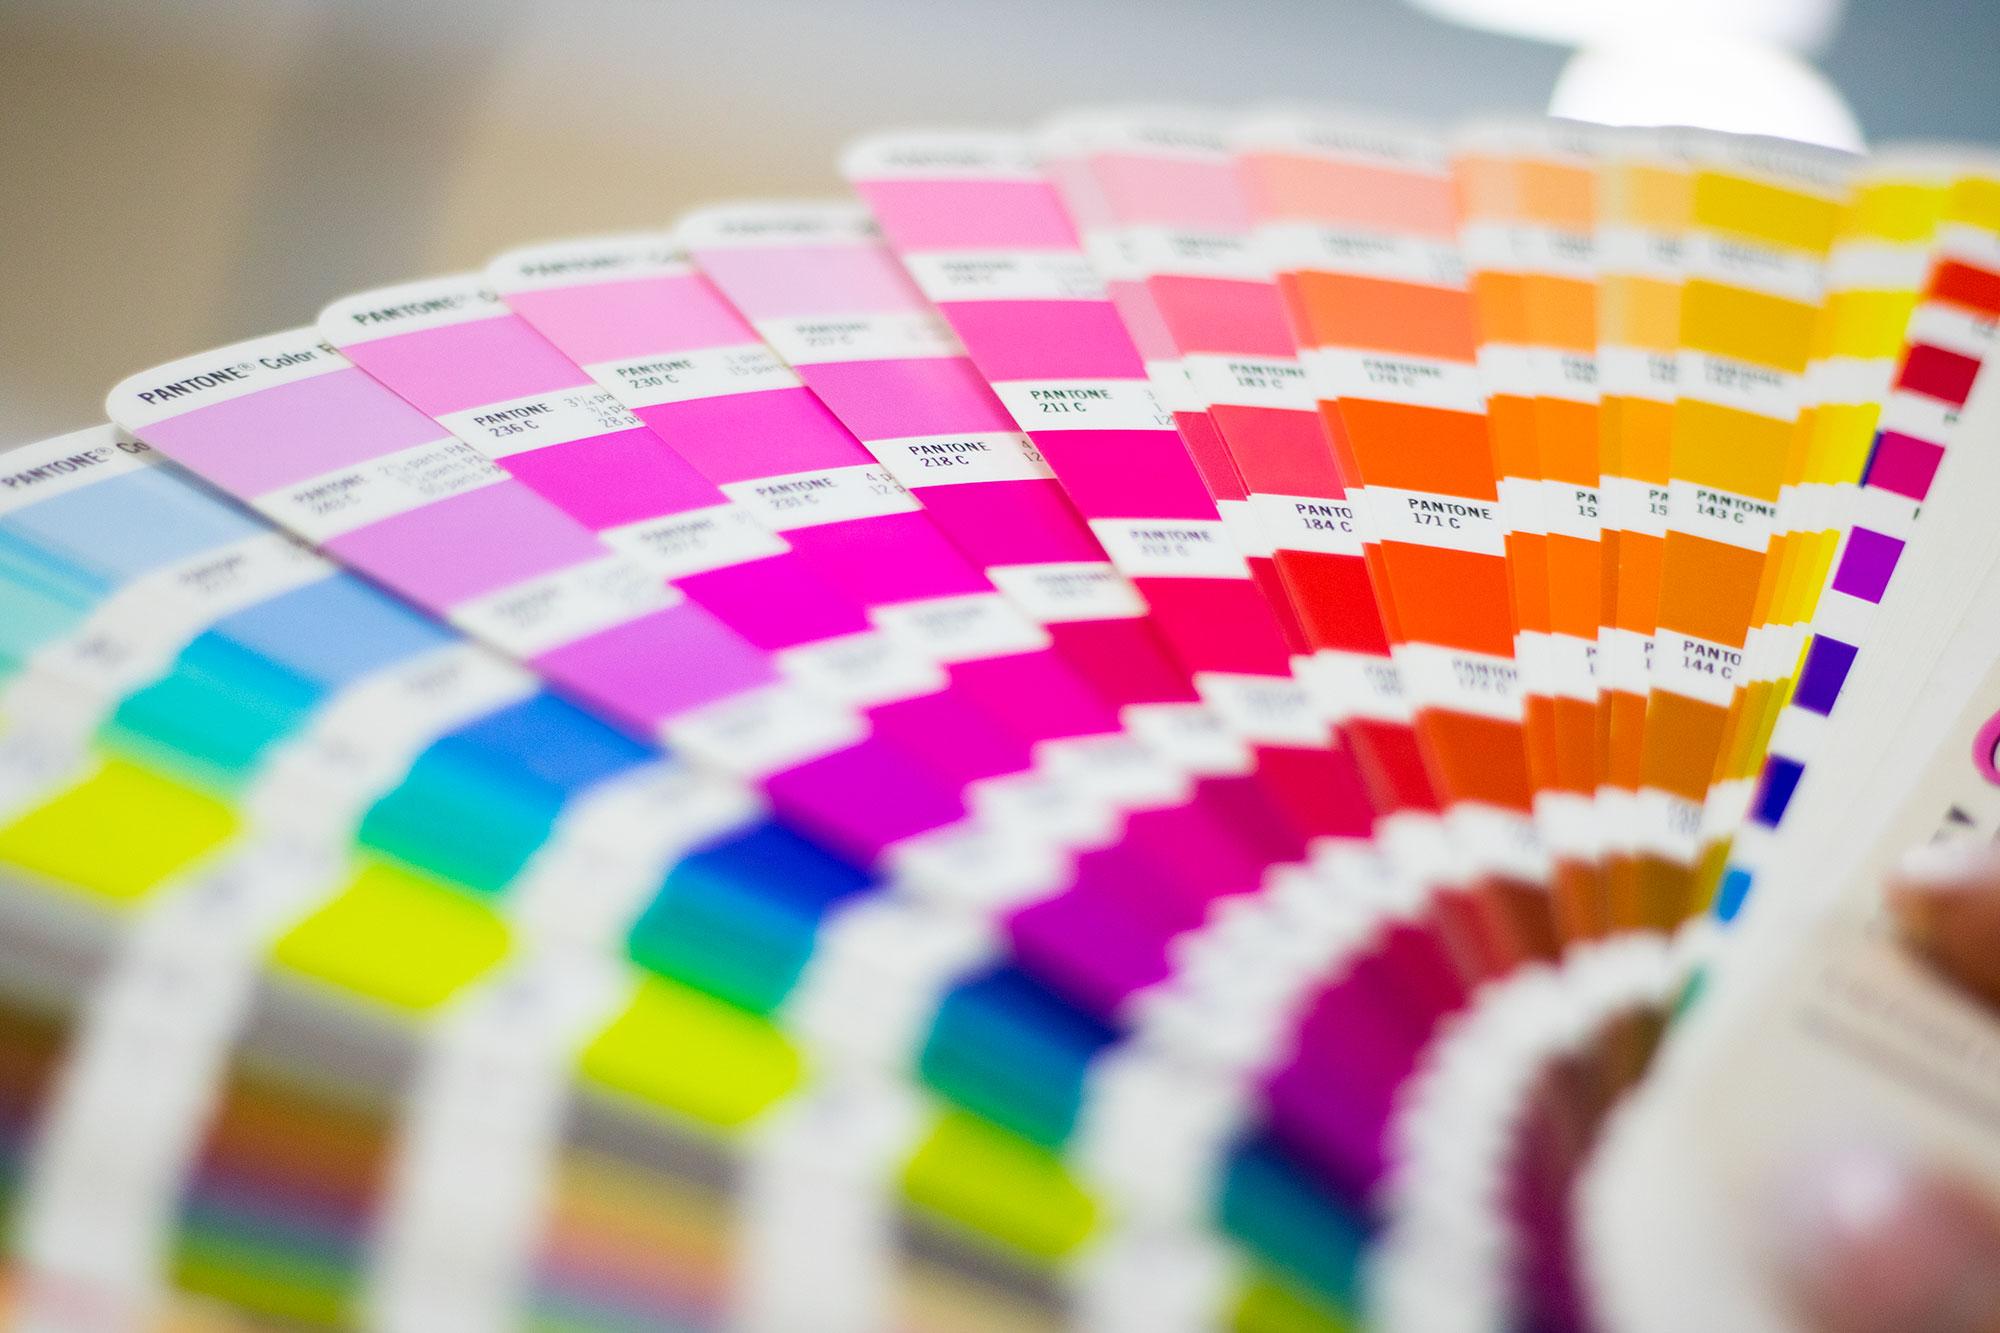 Pantone-Farbfächer: Wir leben Print!